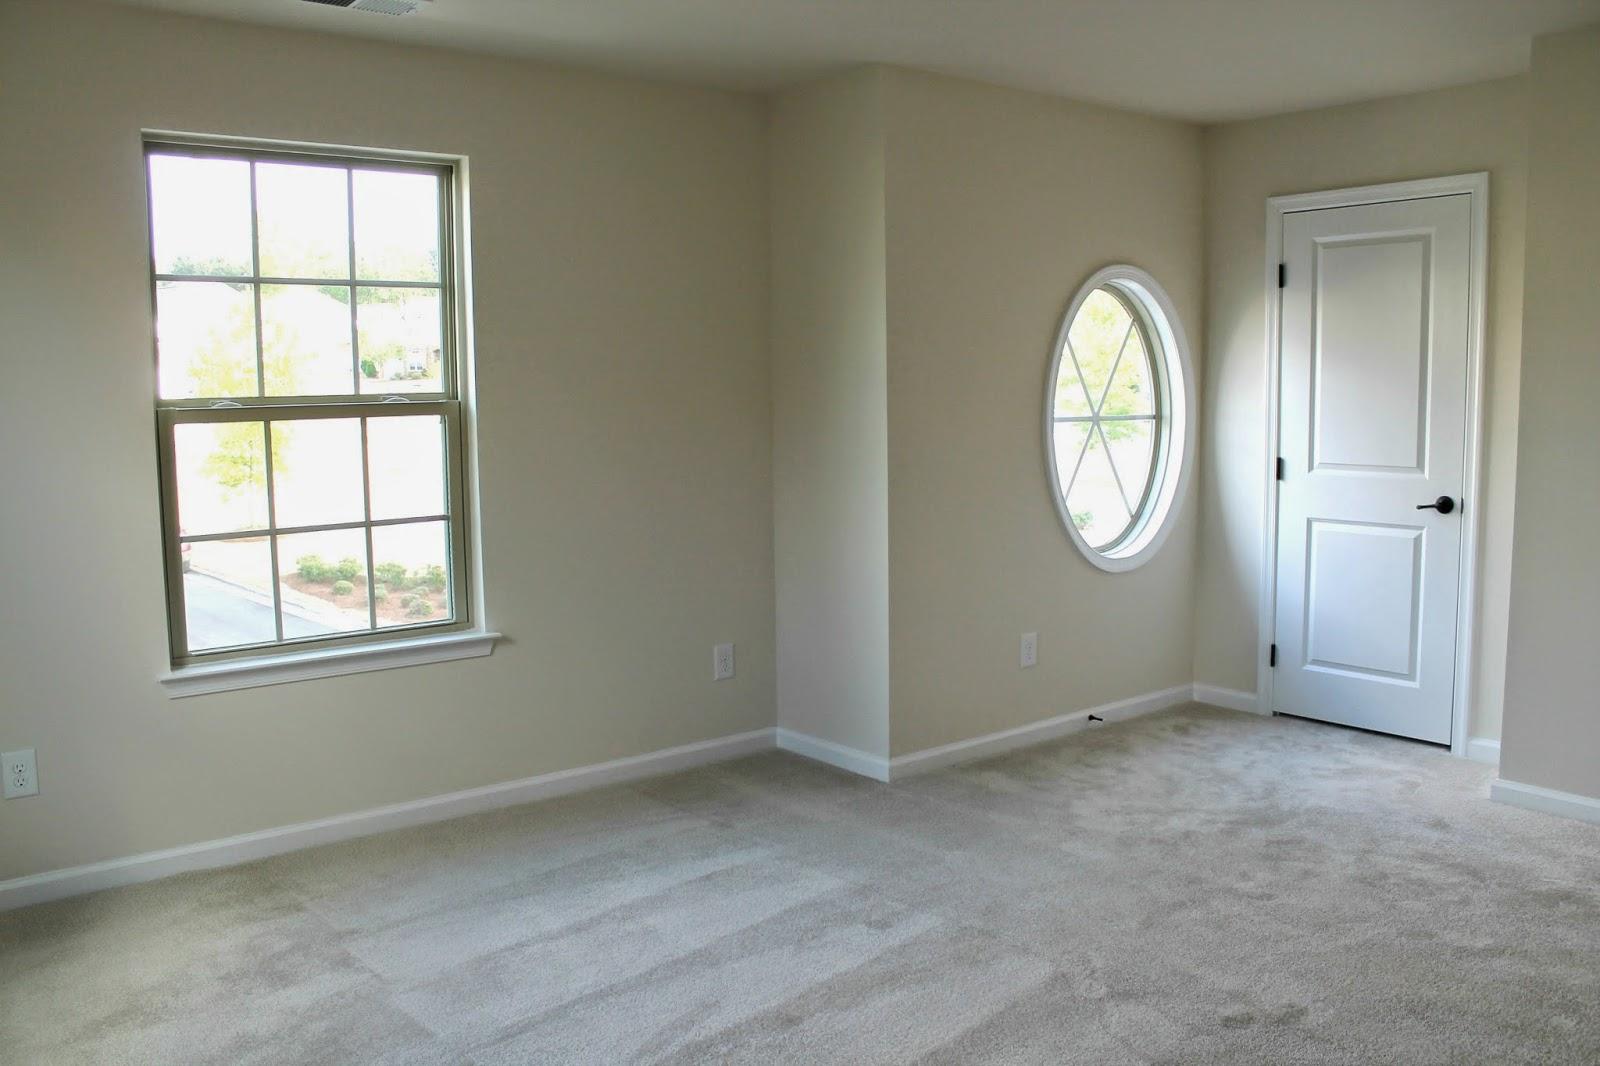 ryan homes naples elevation d guest bedroom